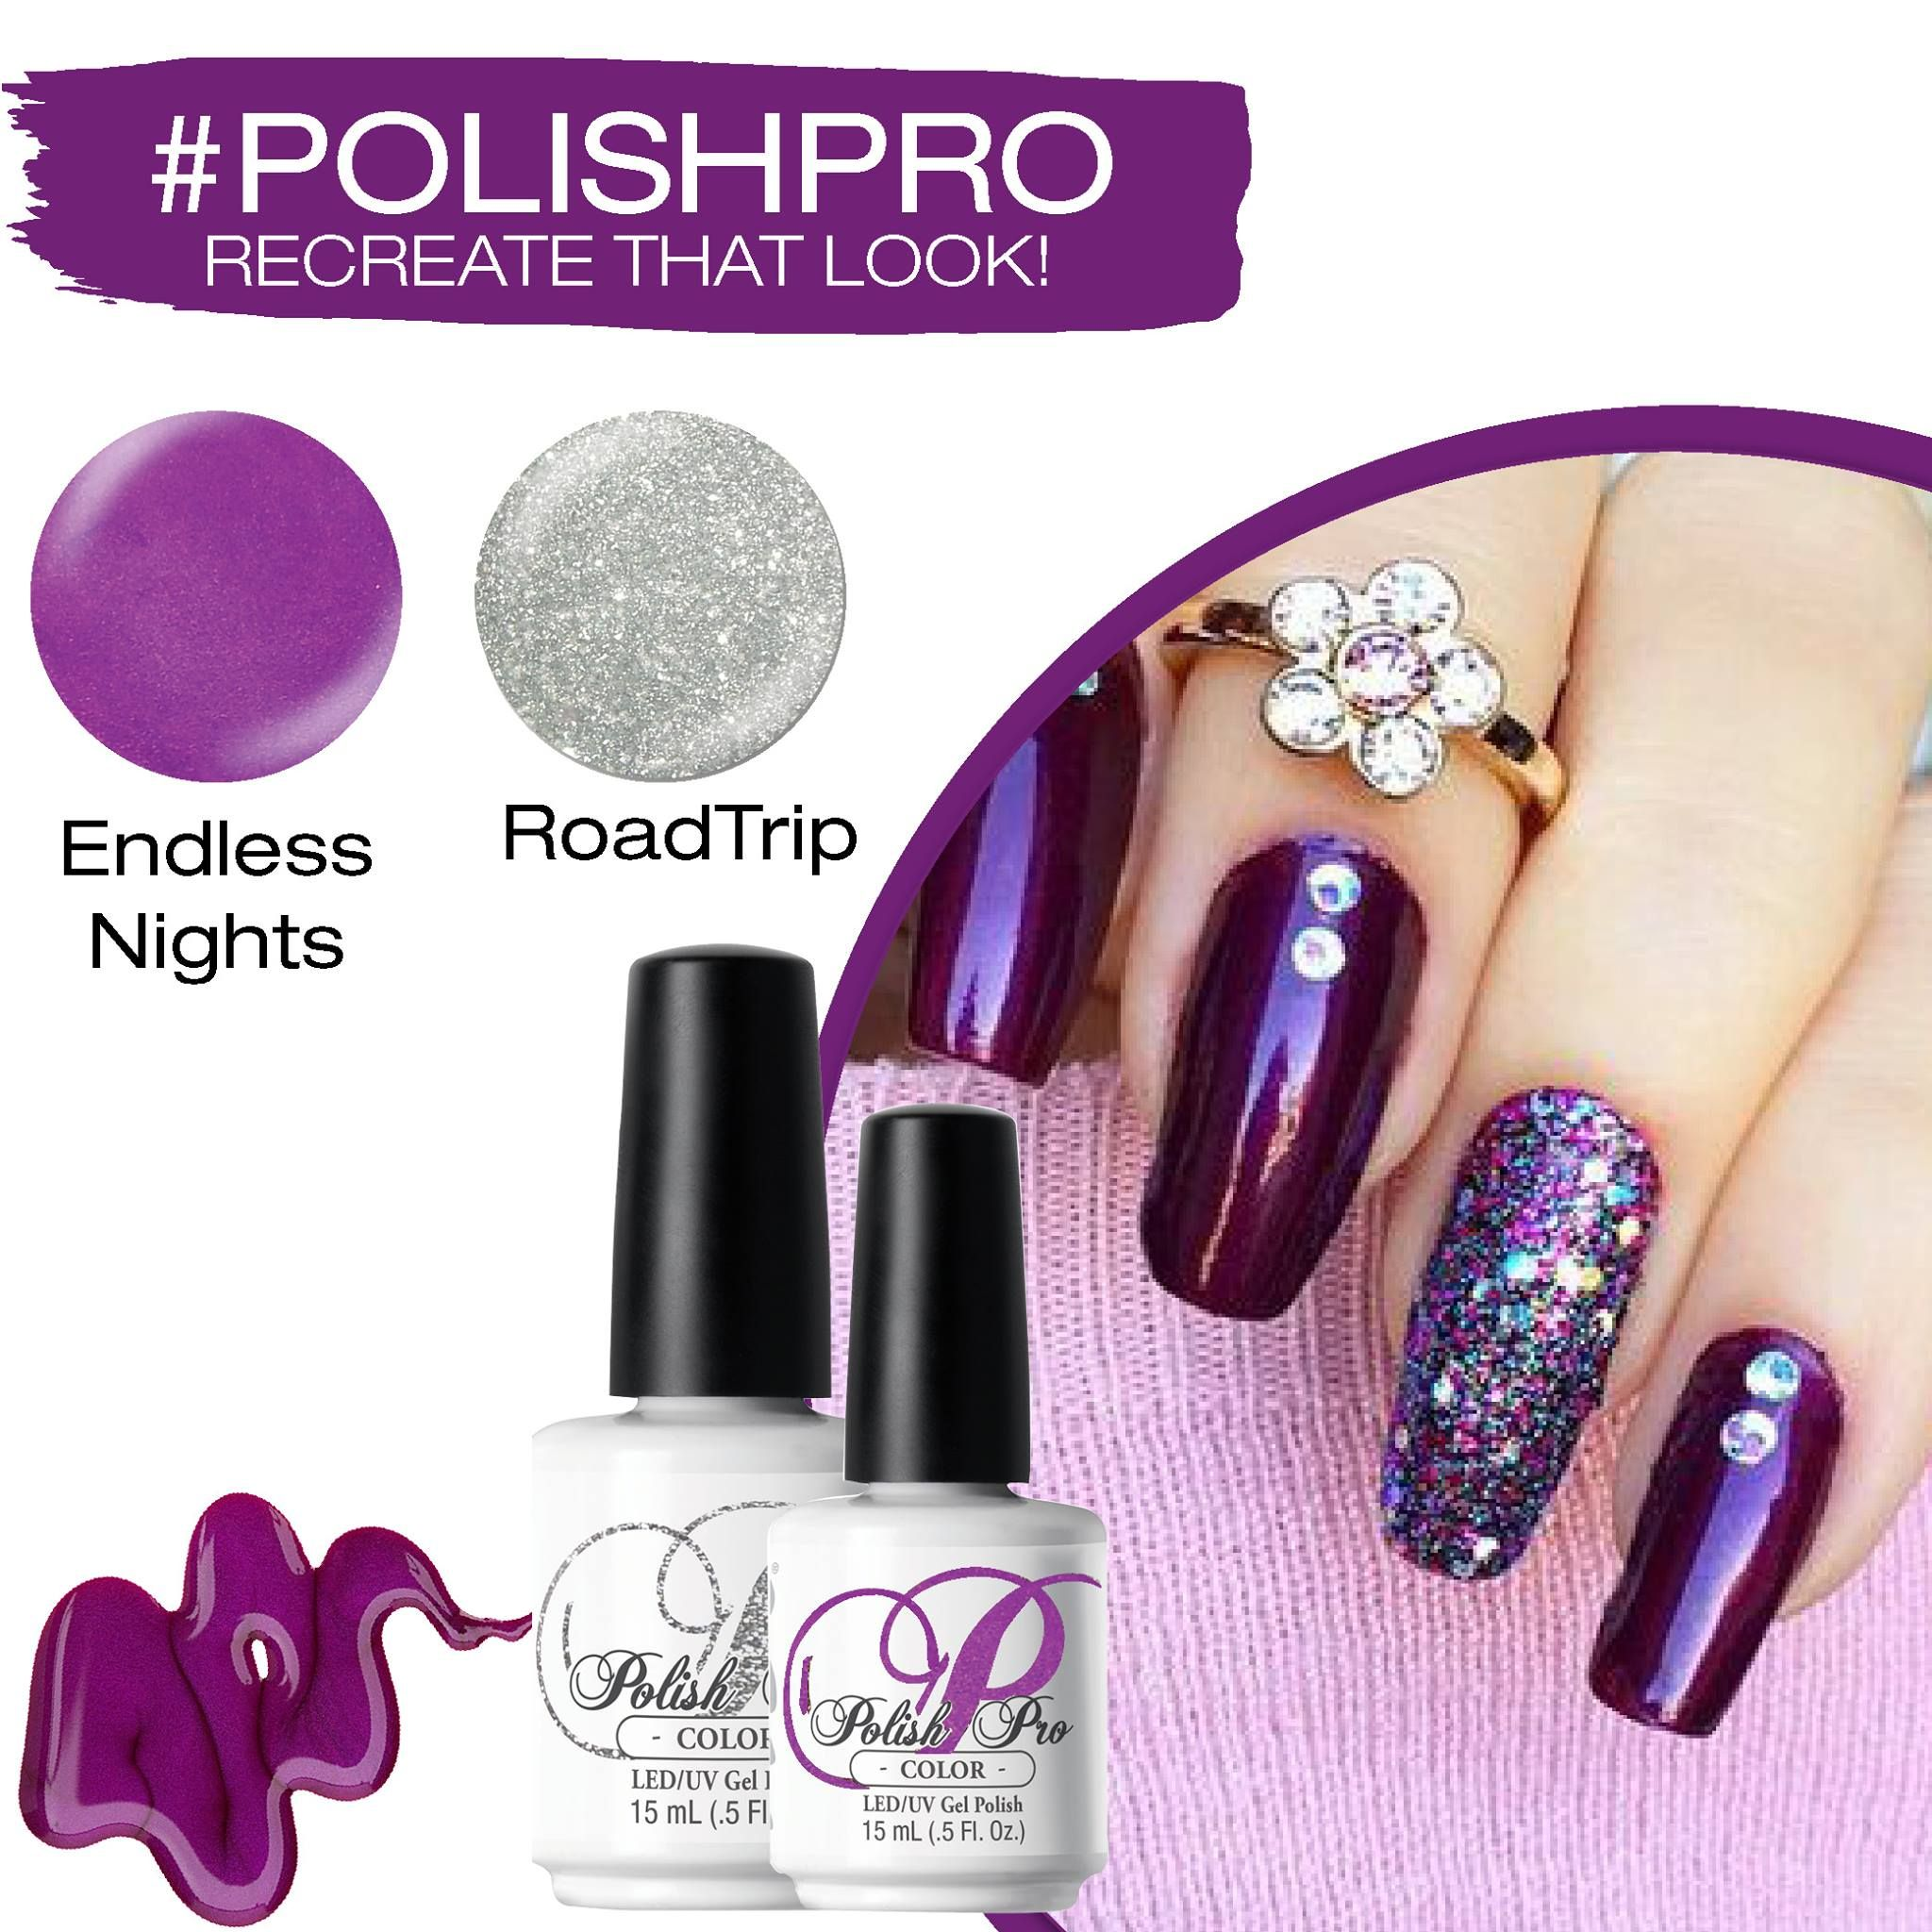 Polish Pro Color in 2019 | Sagittarius - ZODIAC Inspired Nails | Gel ...